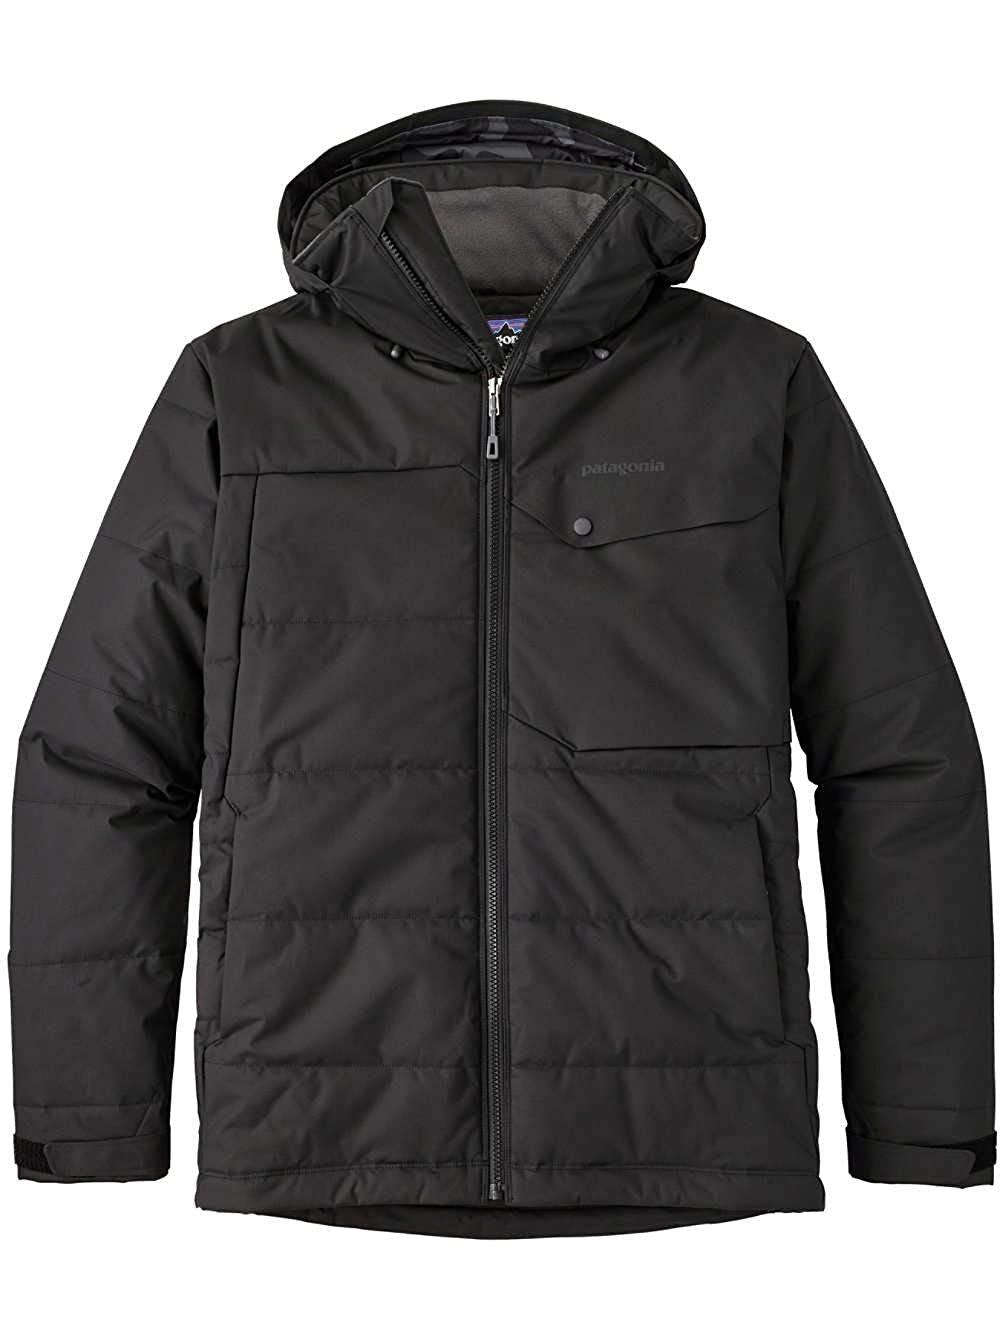 Patagonia Rubicon Jacket Mens